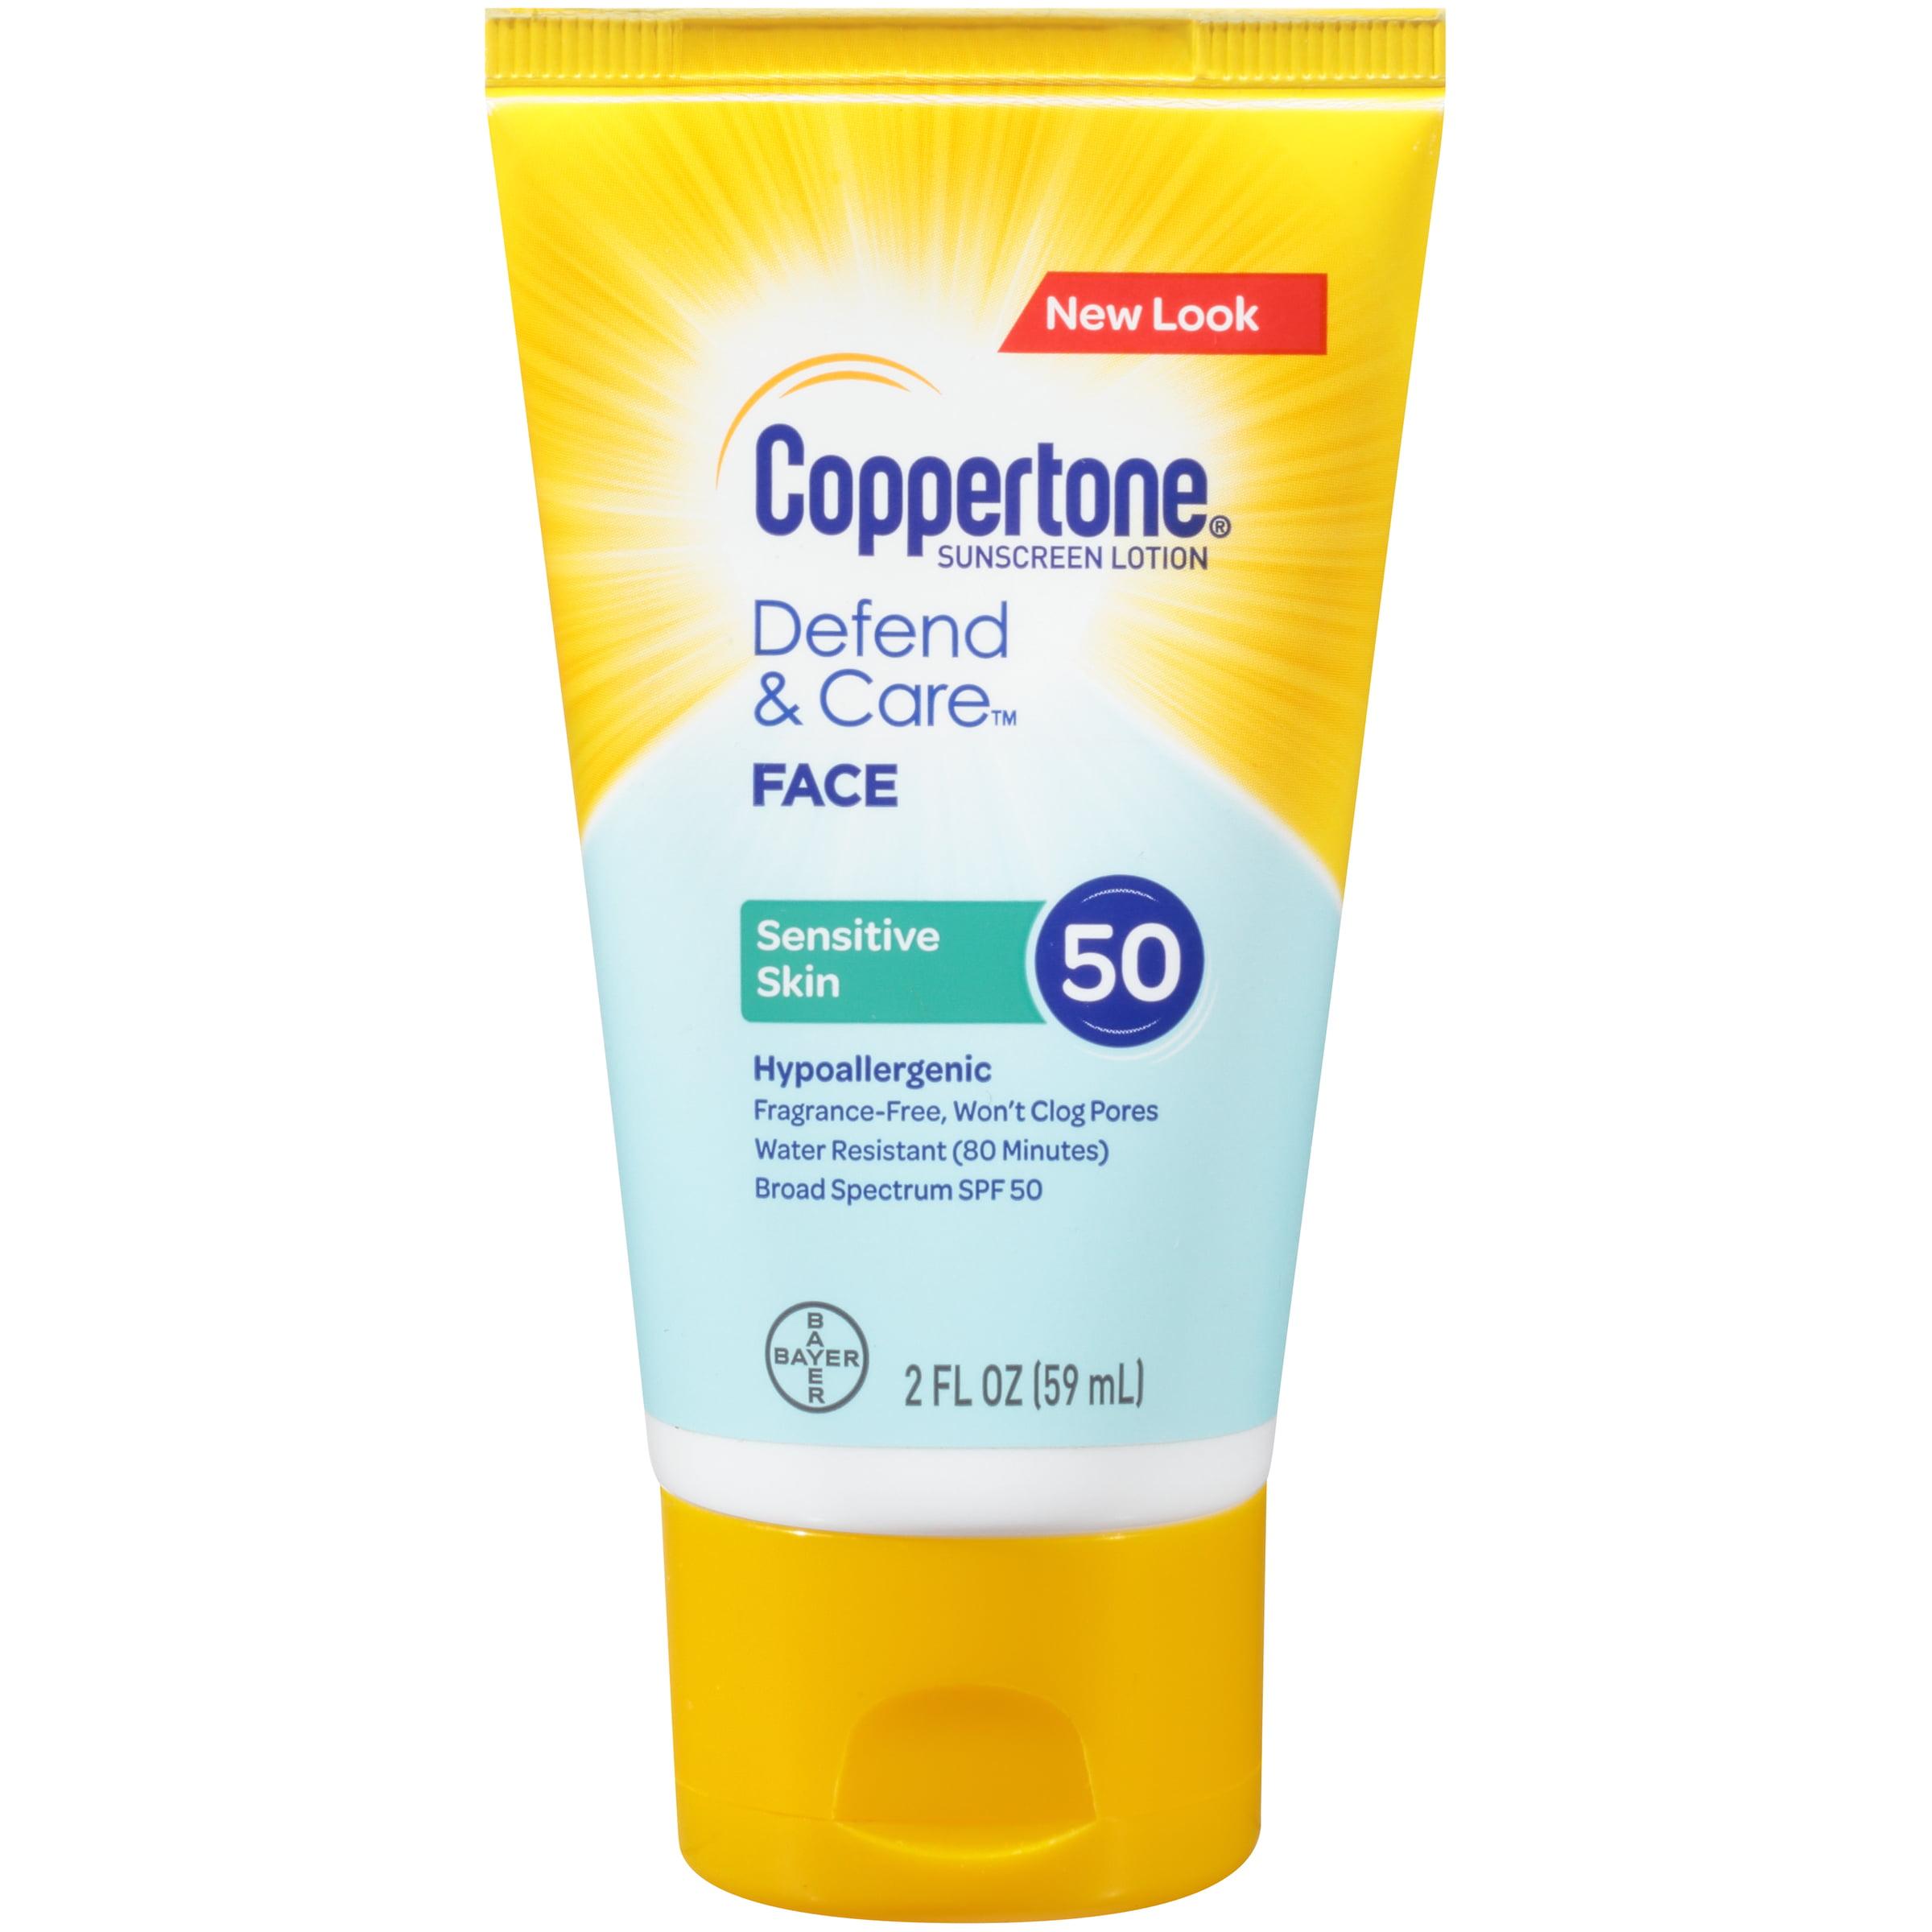 Coppertone Defend & Care Sensitive Skin Sunscreen Face Lotion SPF 50 2oz